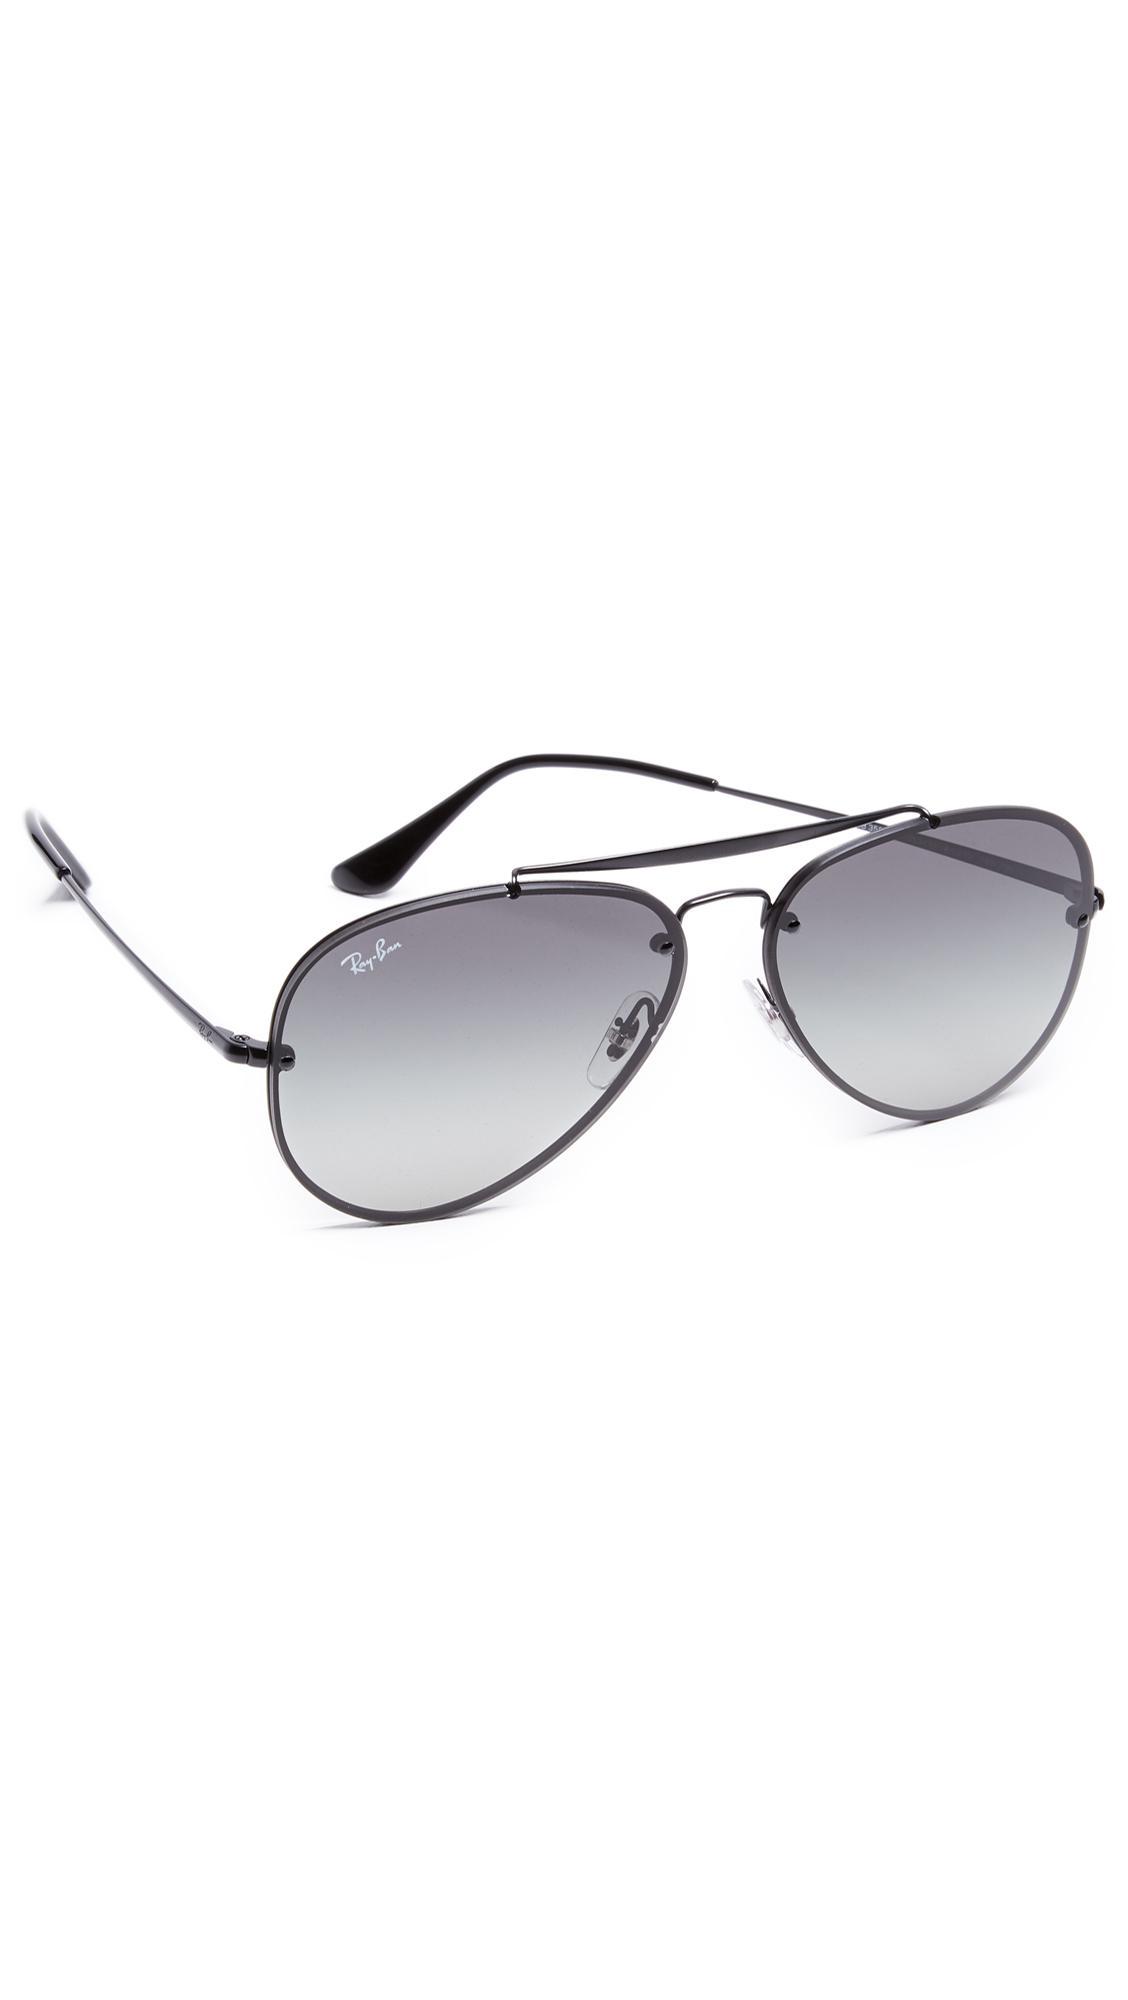 b4c7db8e81beb Ray-Ban Blaze Aviator Sunglasses in Gray for Men - Lyst